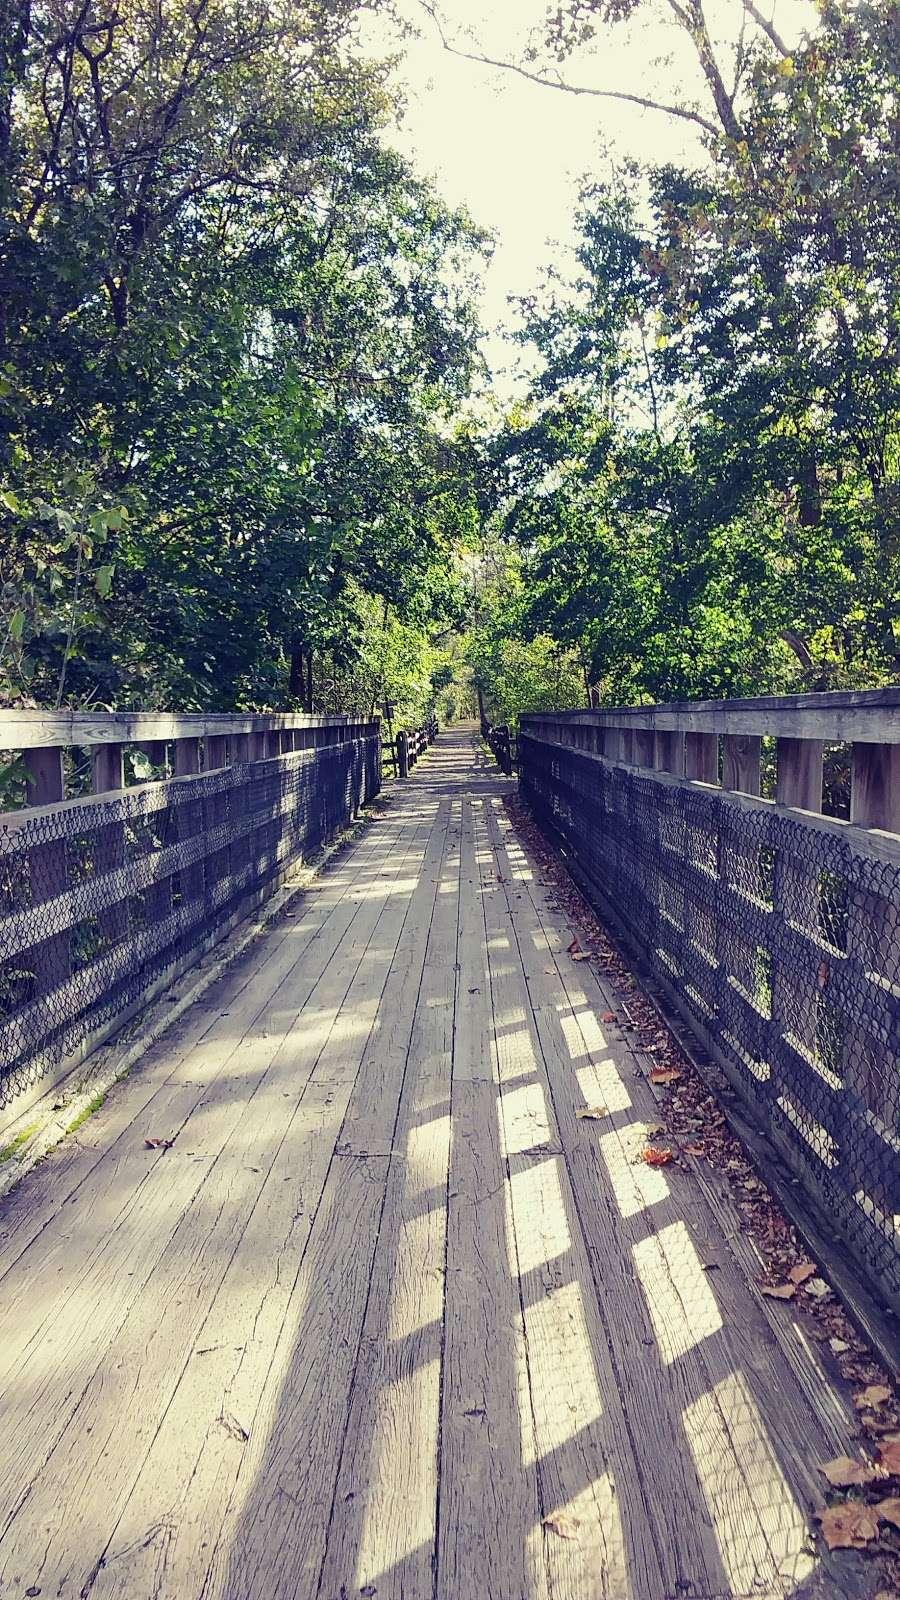 Perkiomen Trail Crusher Road Parking Area - park  | Photo 6 of 10 | Address: Perkiomen Trail, Perkiomenville, PA 18074, USA | Phone: (610) 278-3000